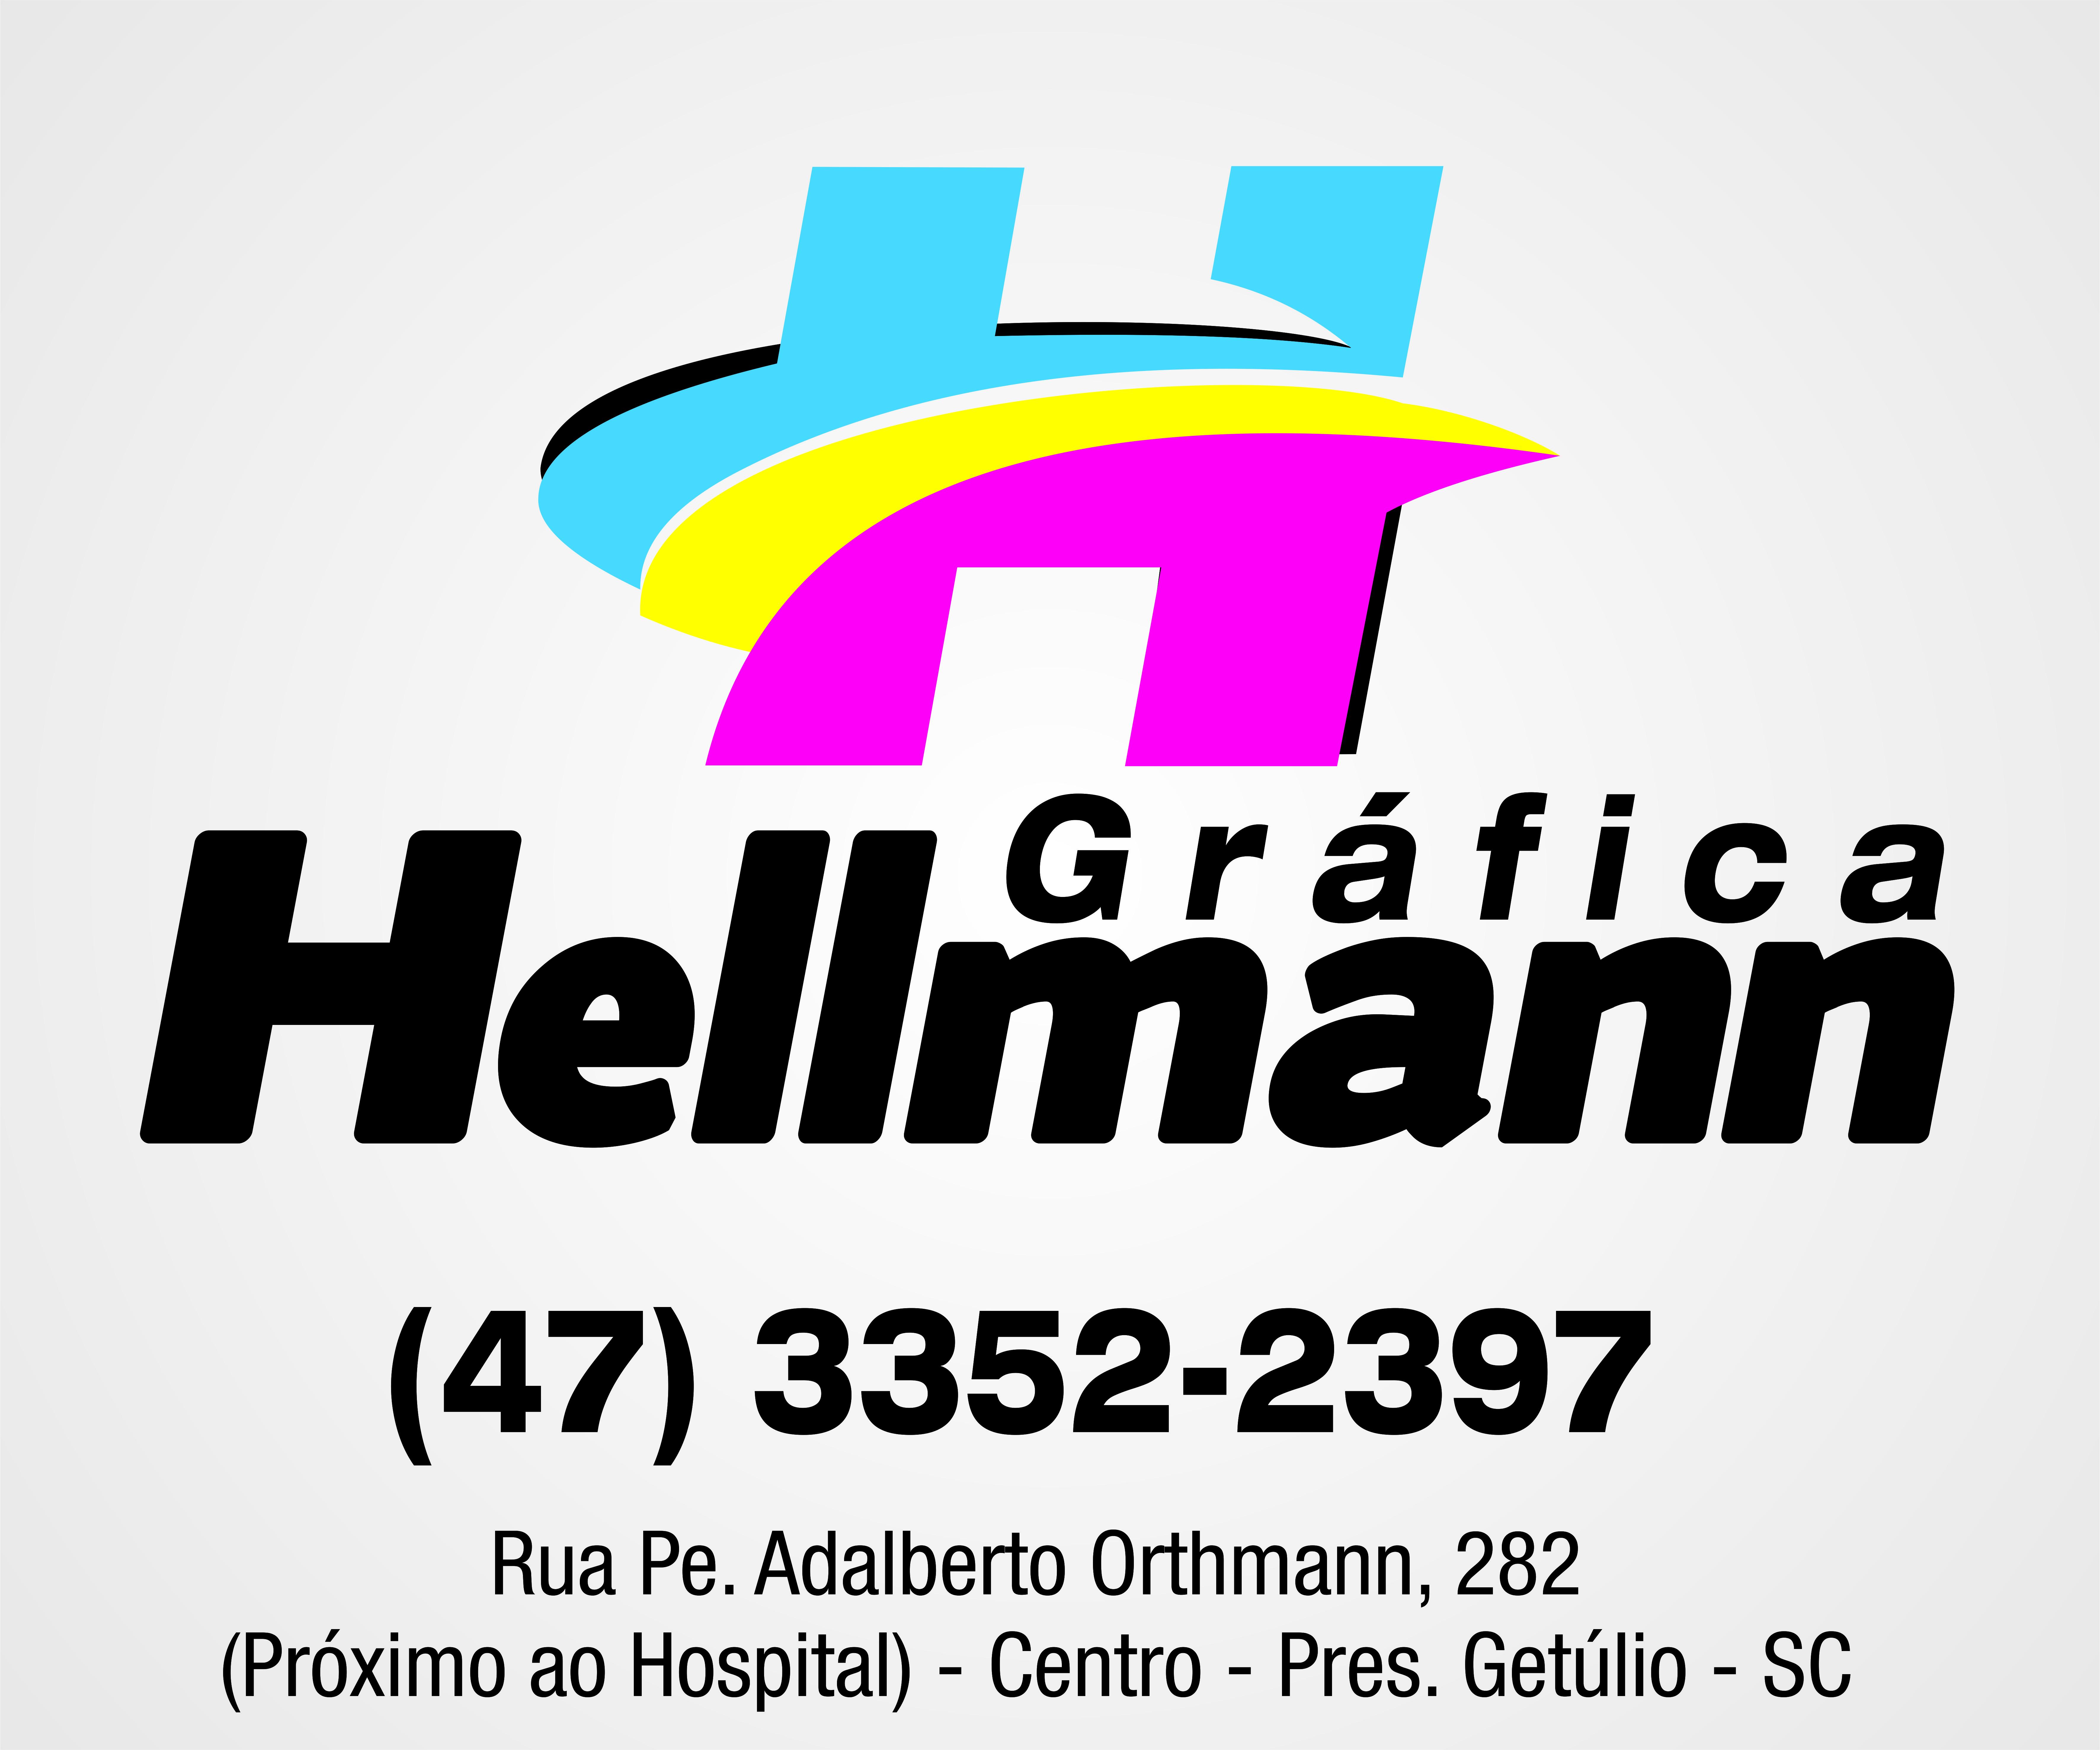 Grafica Hellmann